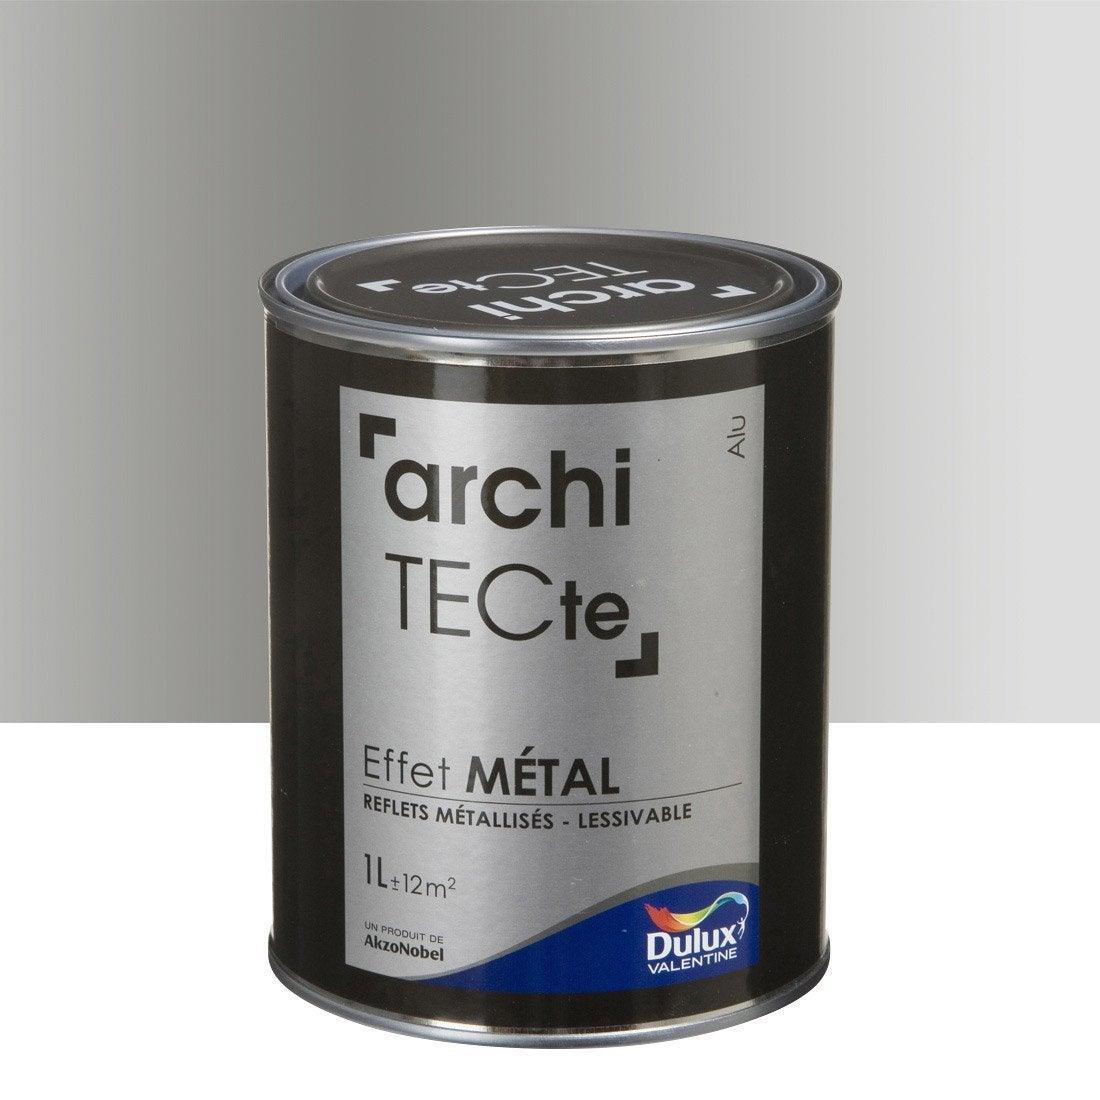 Peinture à Effet, Architecte Effet Métal DULUX VALENTINE, Gris Aluminium, 1  L Idee